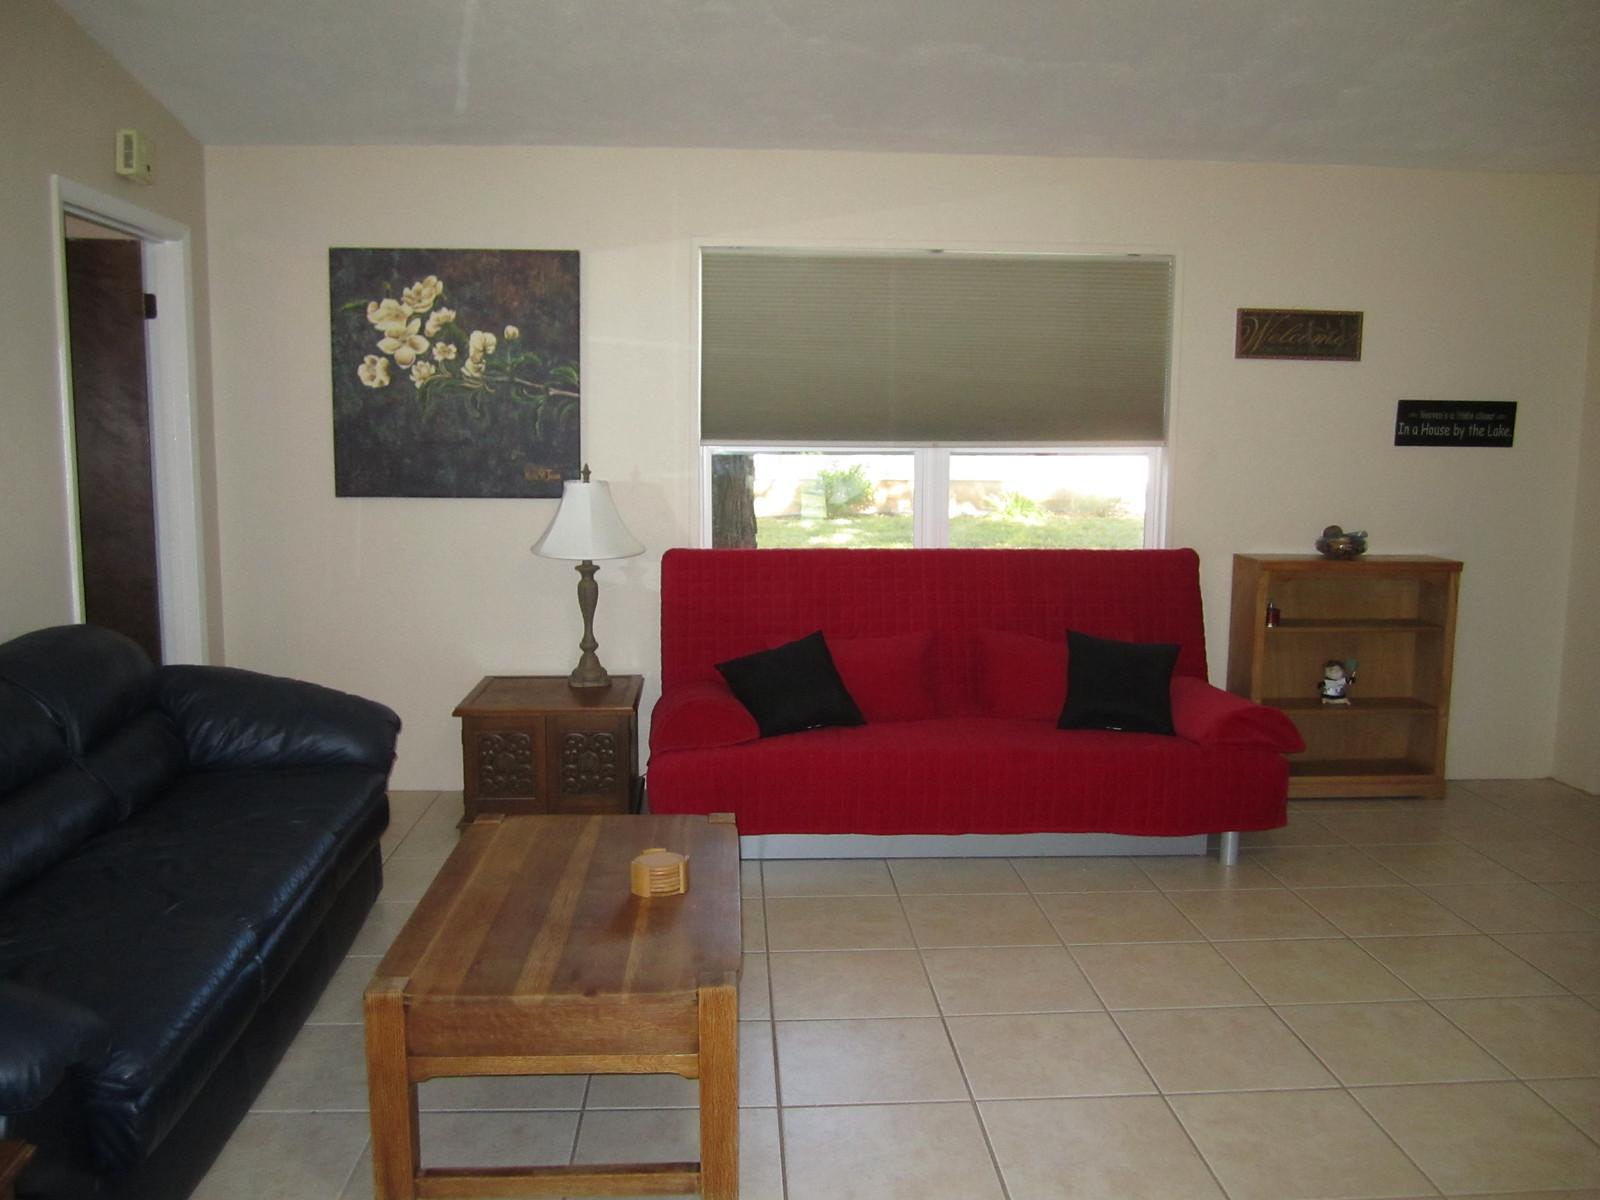 Living Room Queen Size Futons Interior Design Company